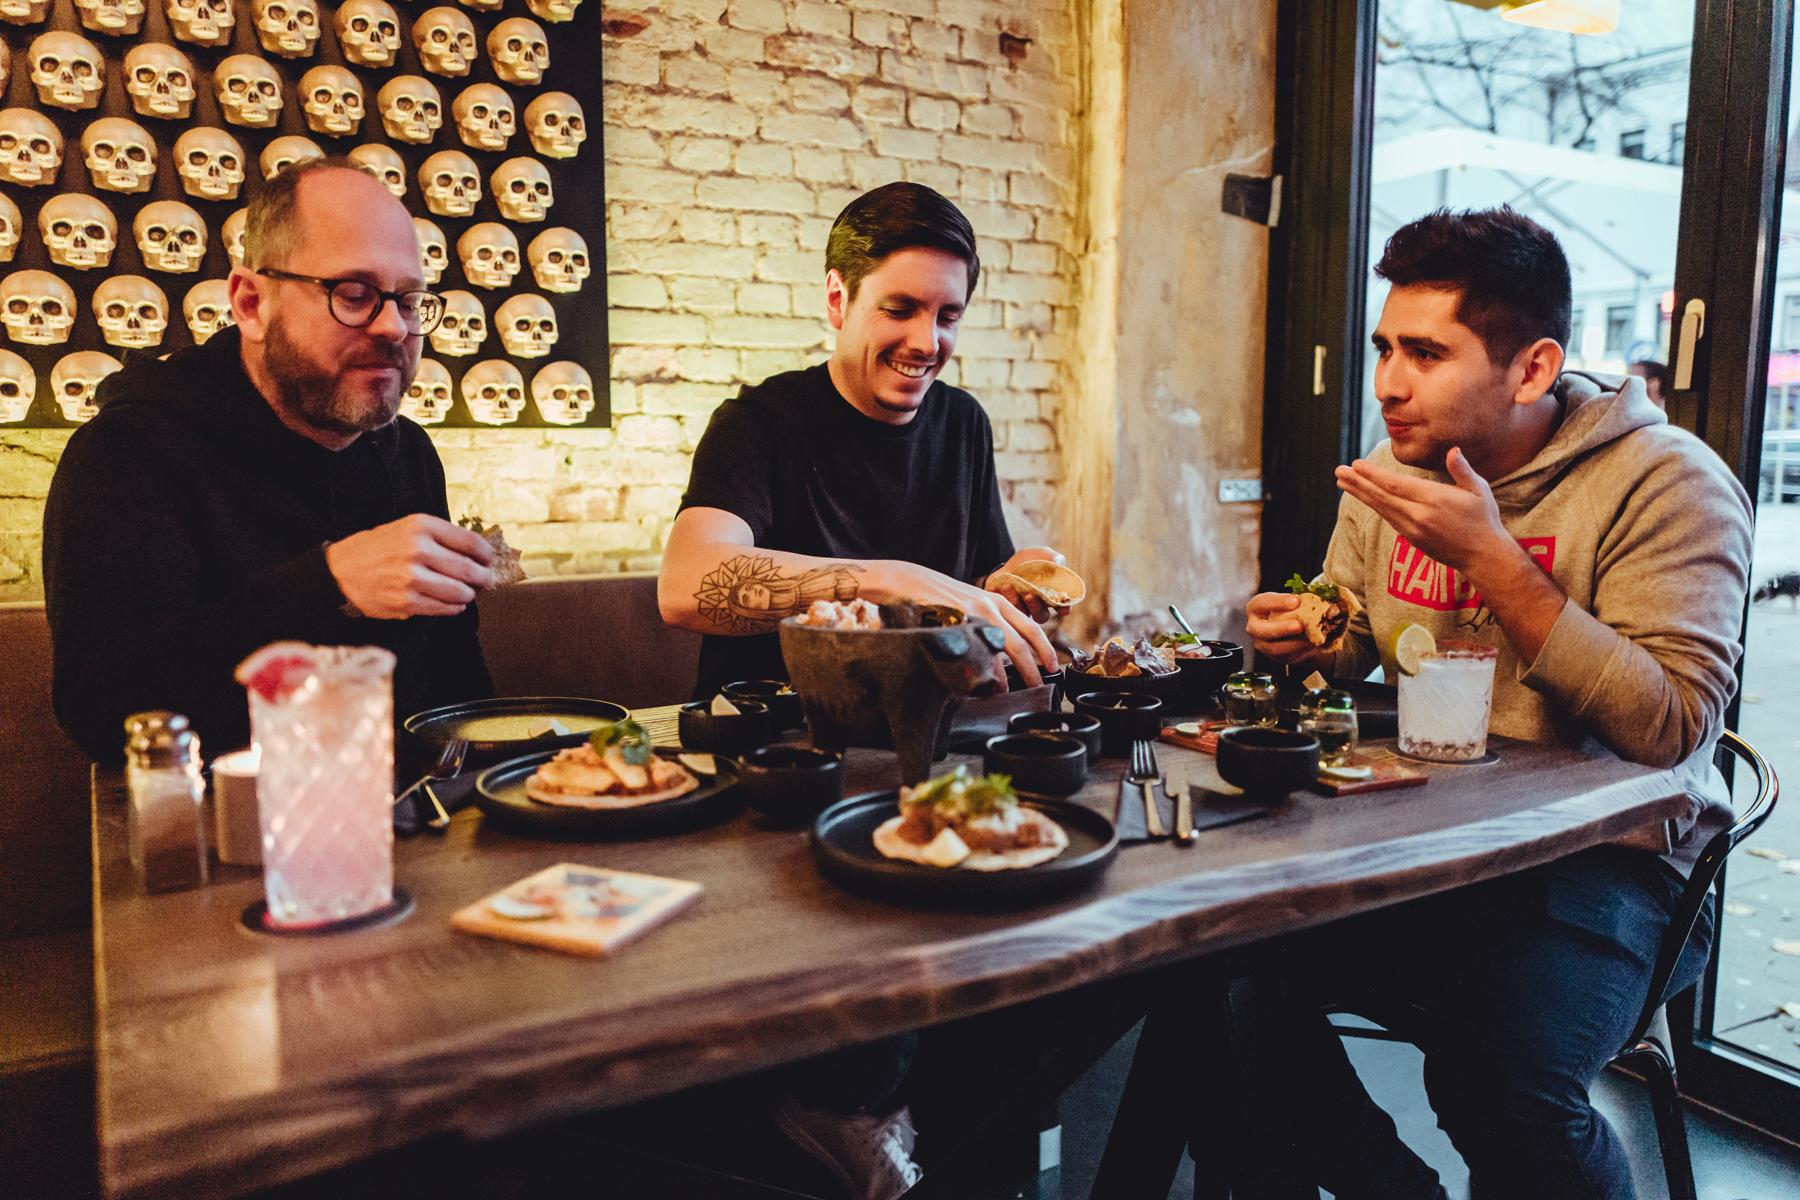 Geheimtipp Hamburg Essen & Trinken Bar Restaurant St Pauli Holy Taco Dahlina Sophie Kock 21